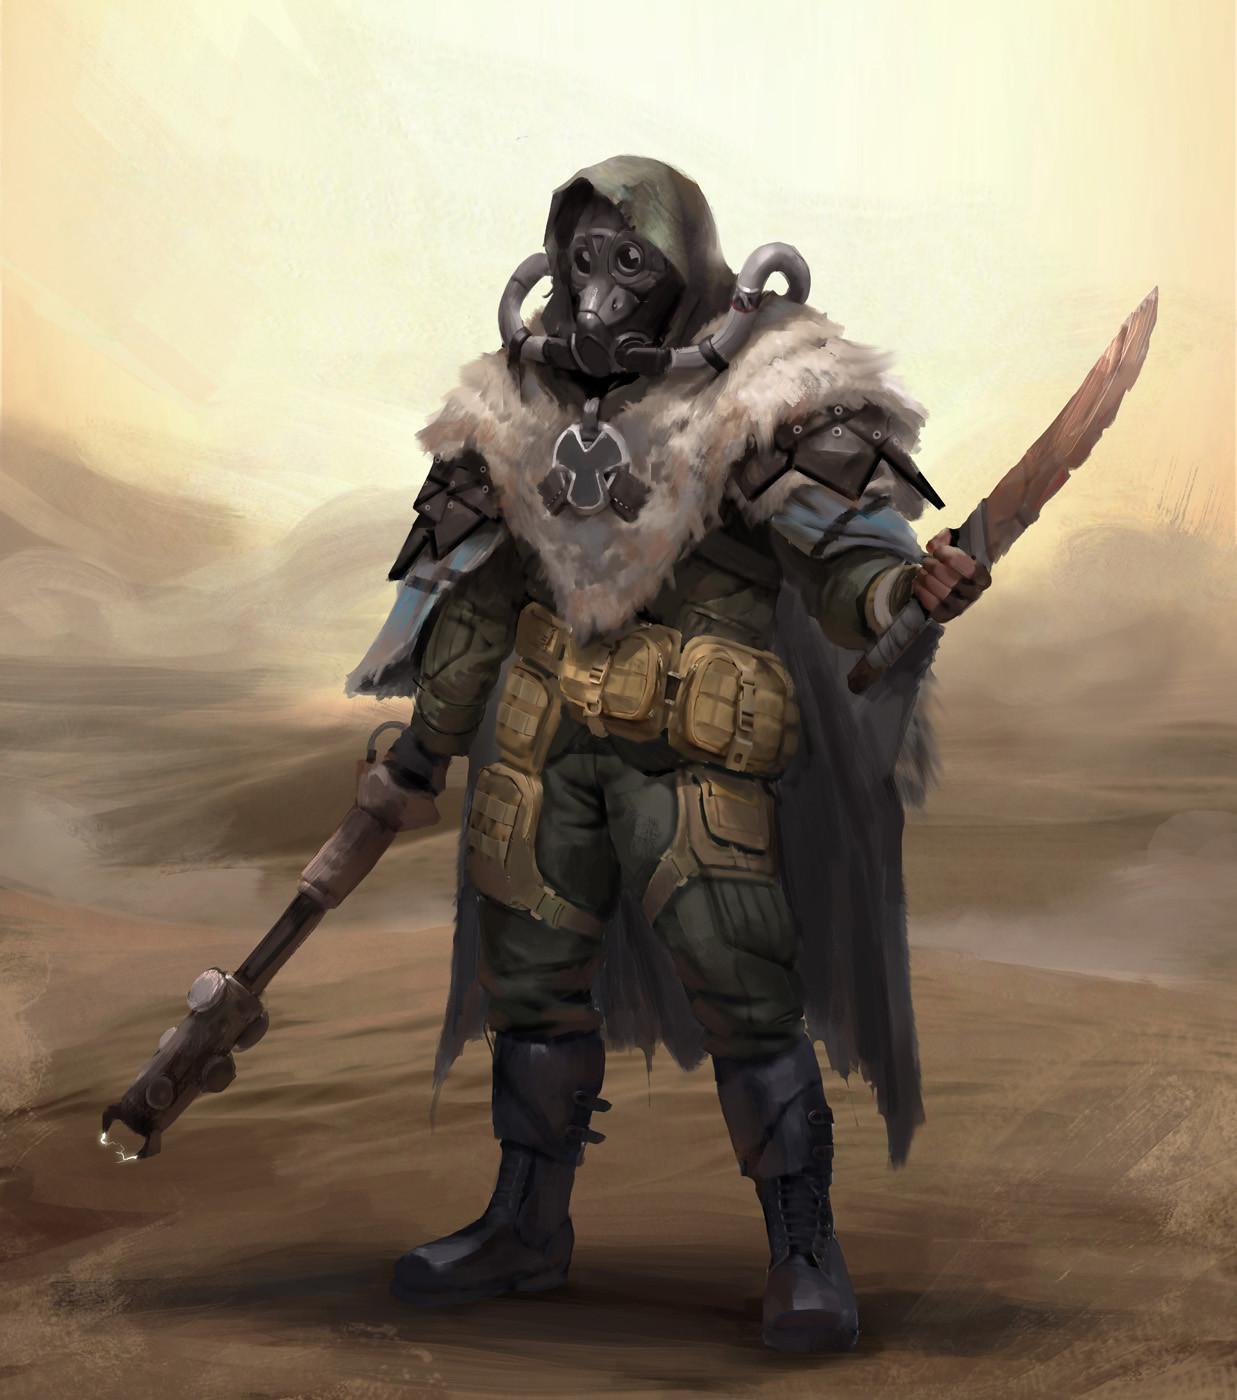 Post-apocalyptic scavanger